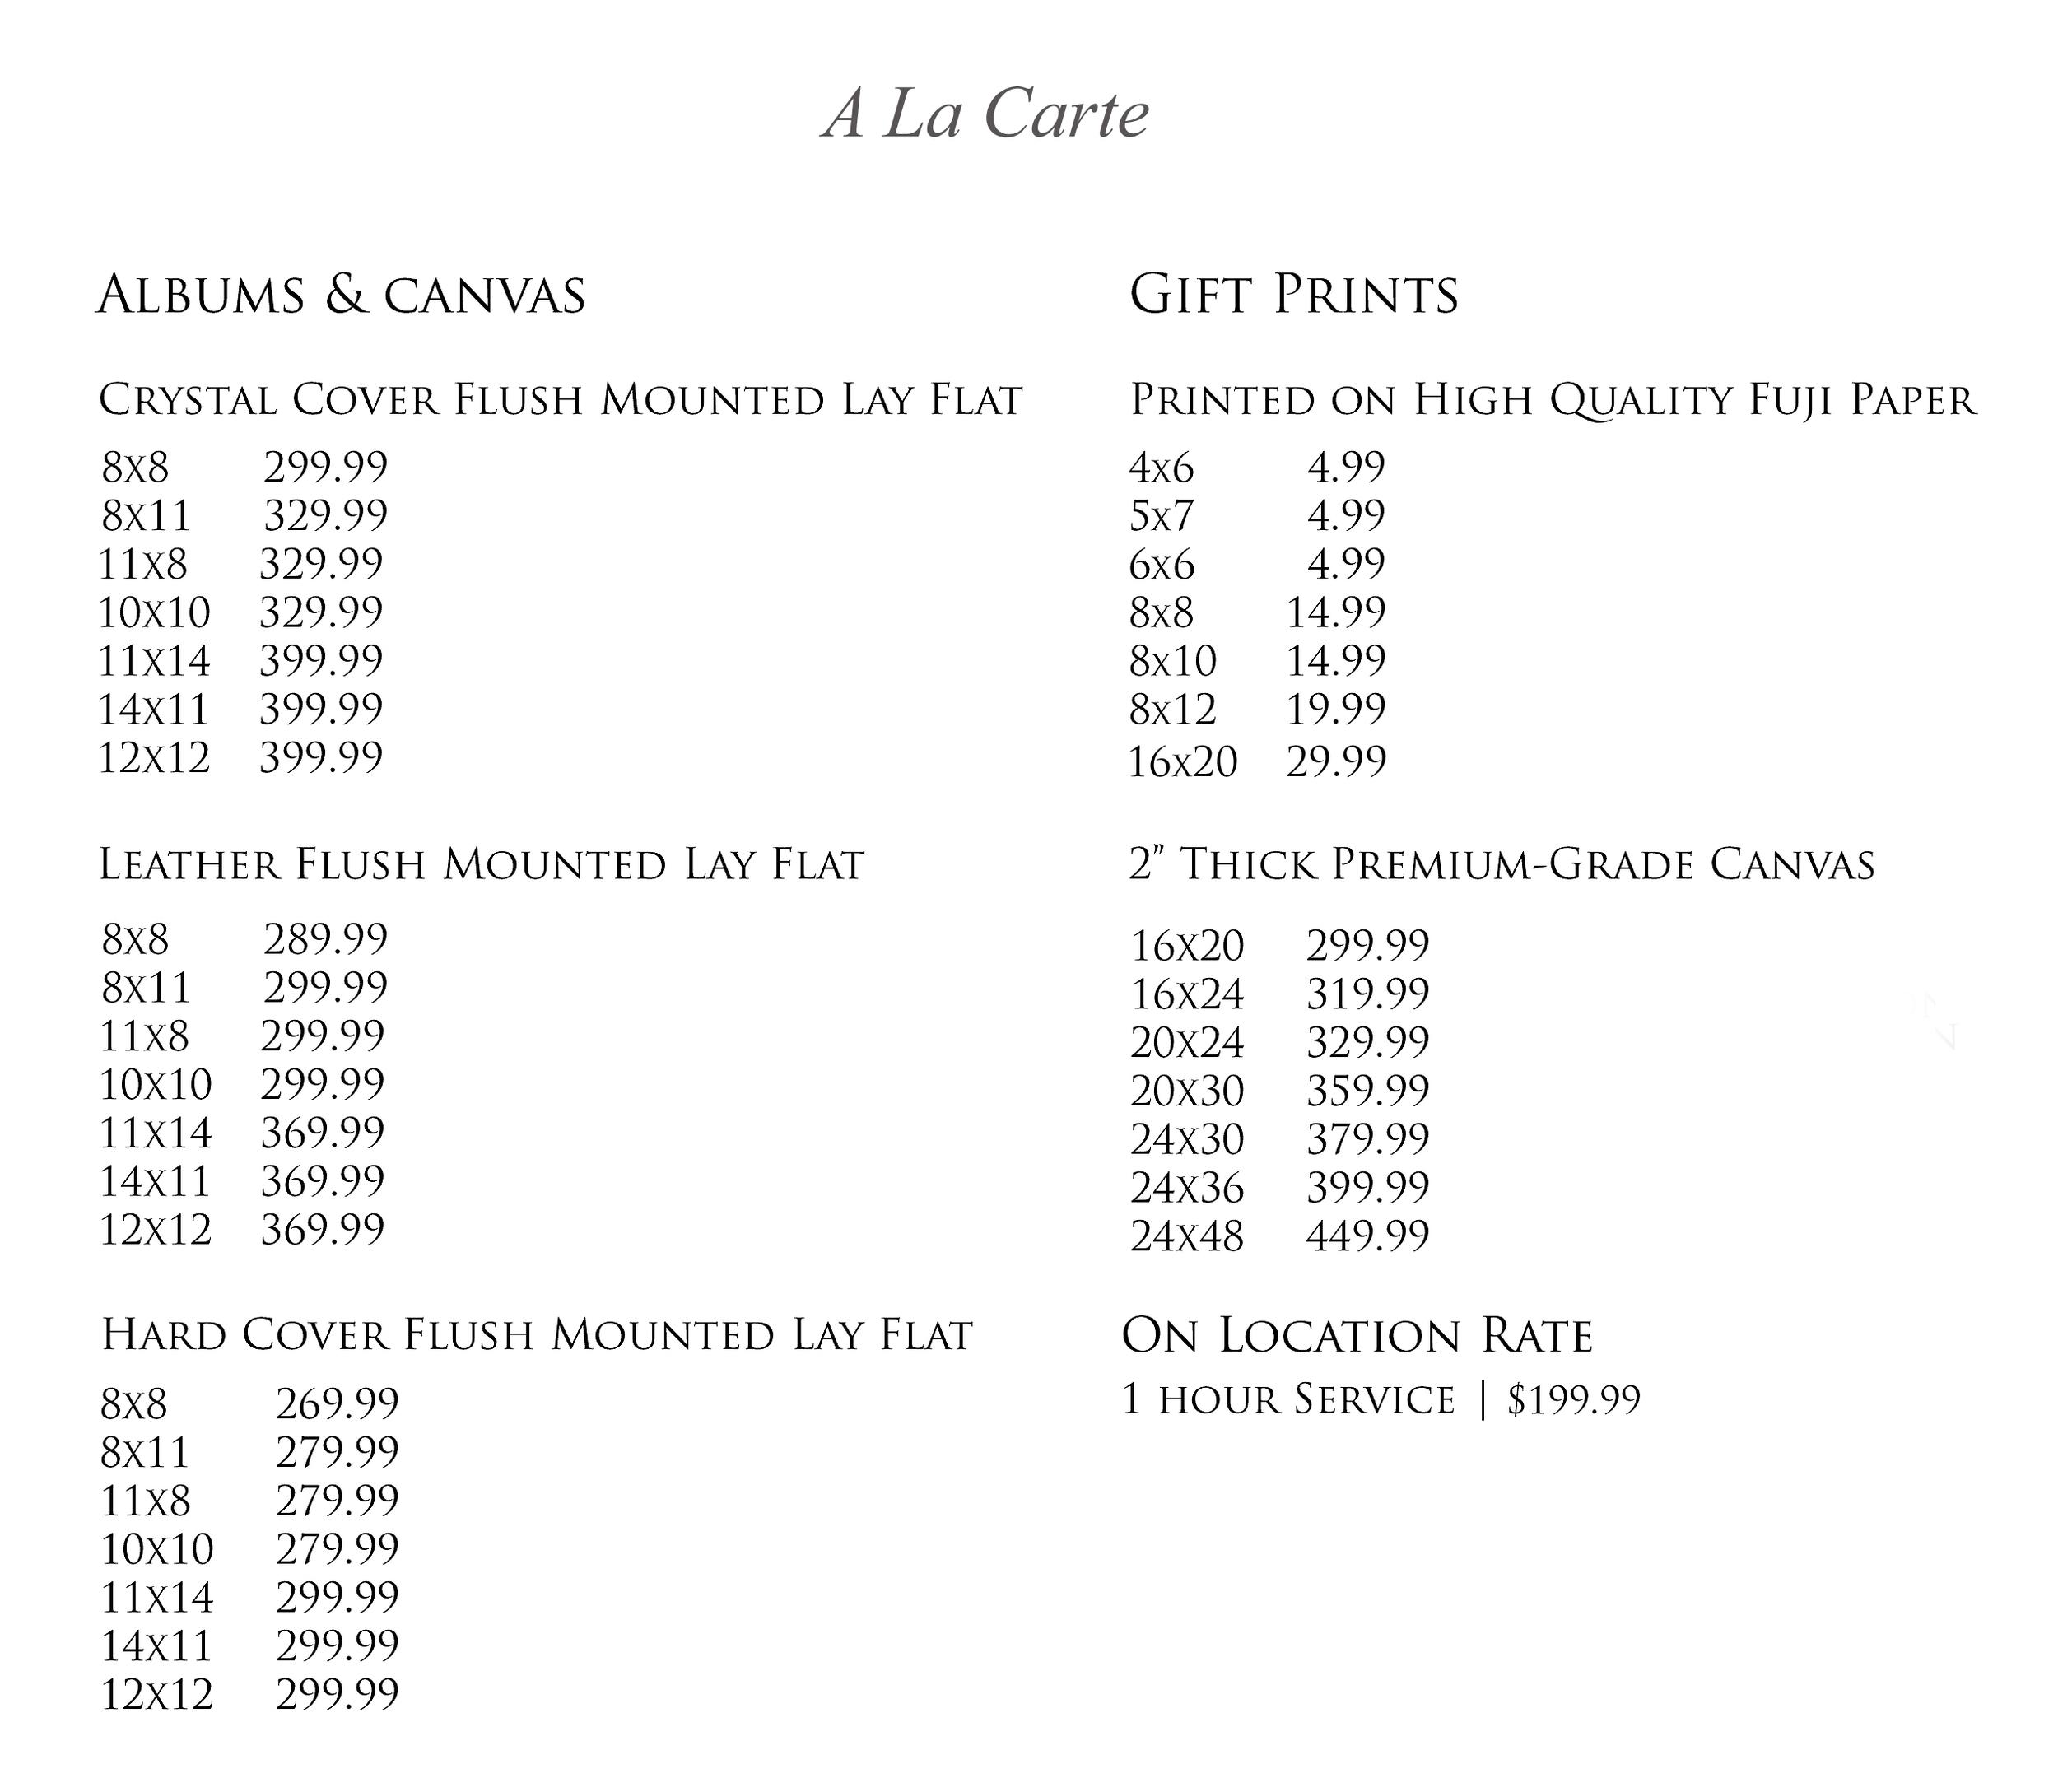 A La Carte Prices 2014.jpg